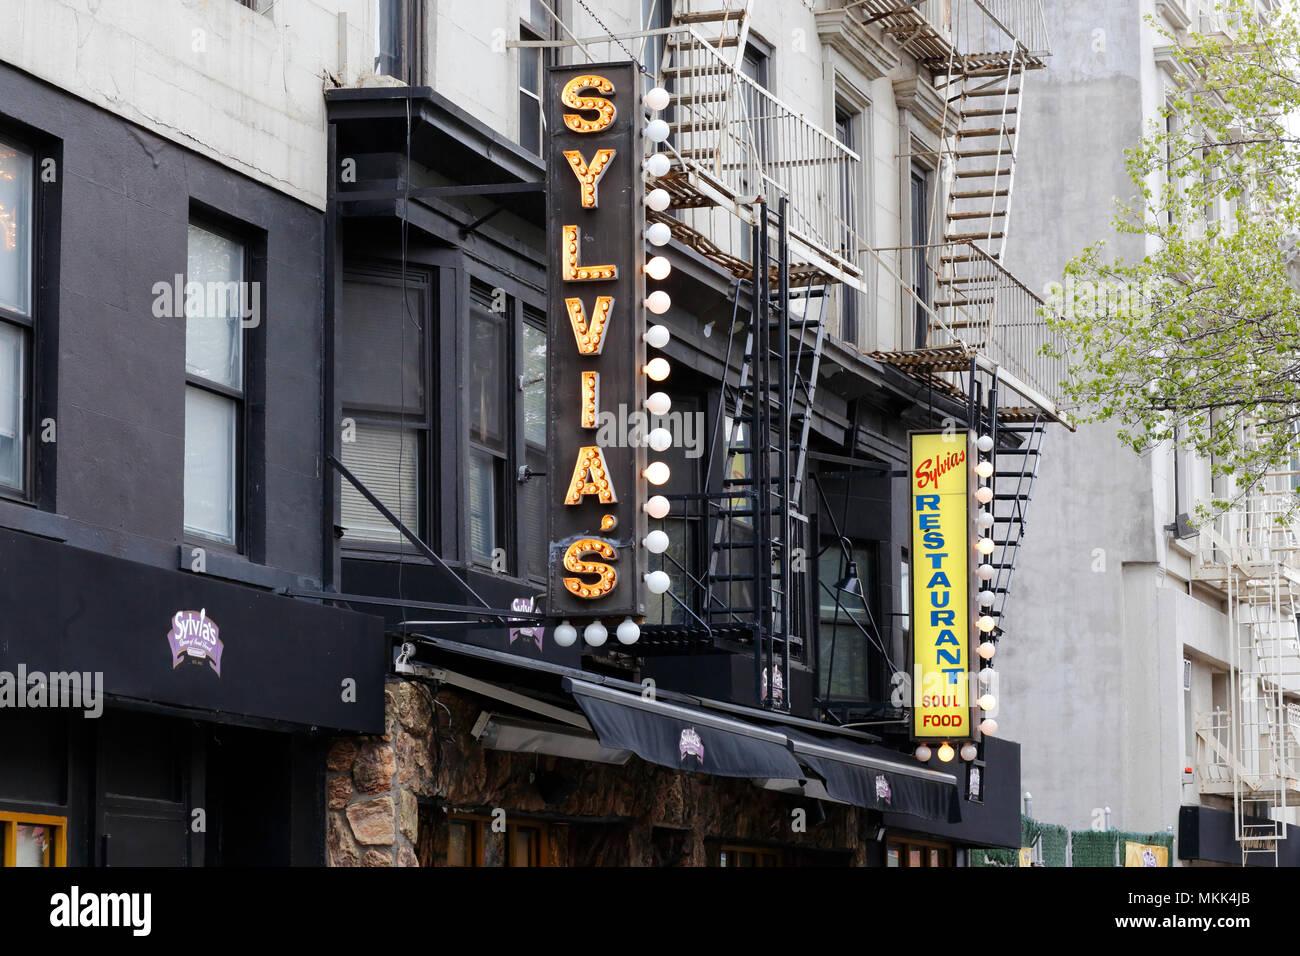 Soul Food New York Stockfotos & Soul Food New York Bilder - Alamy